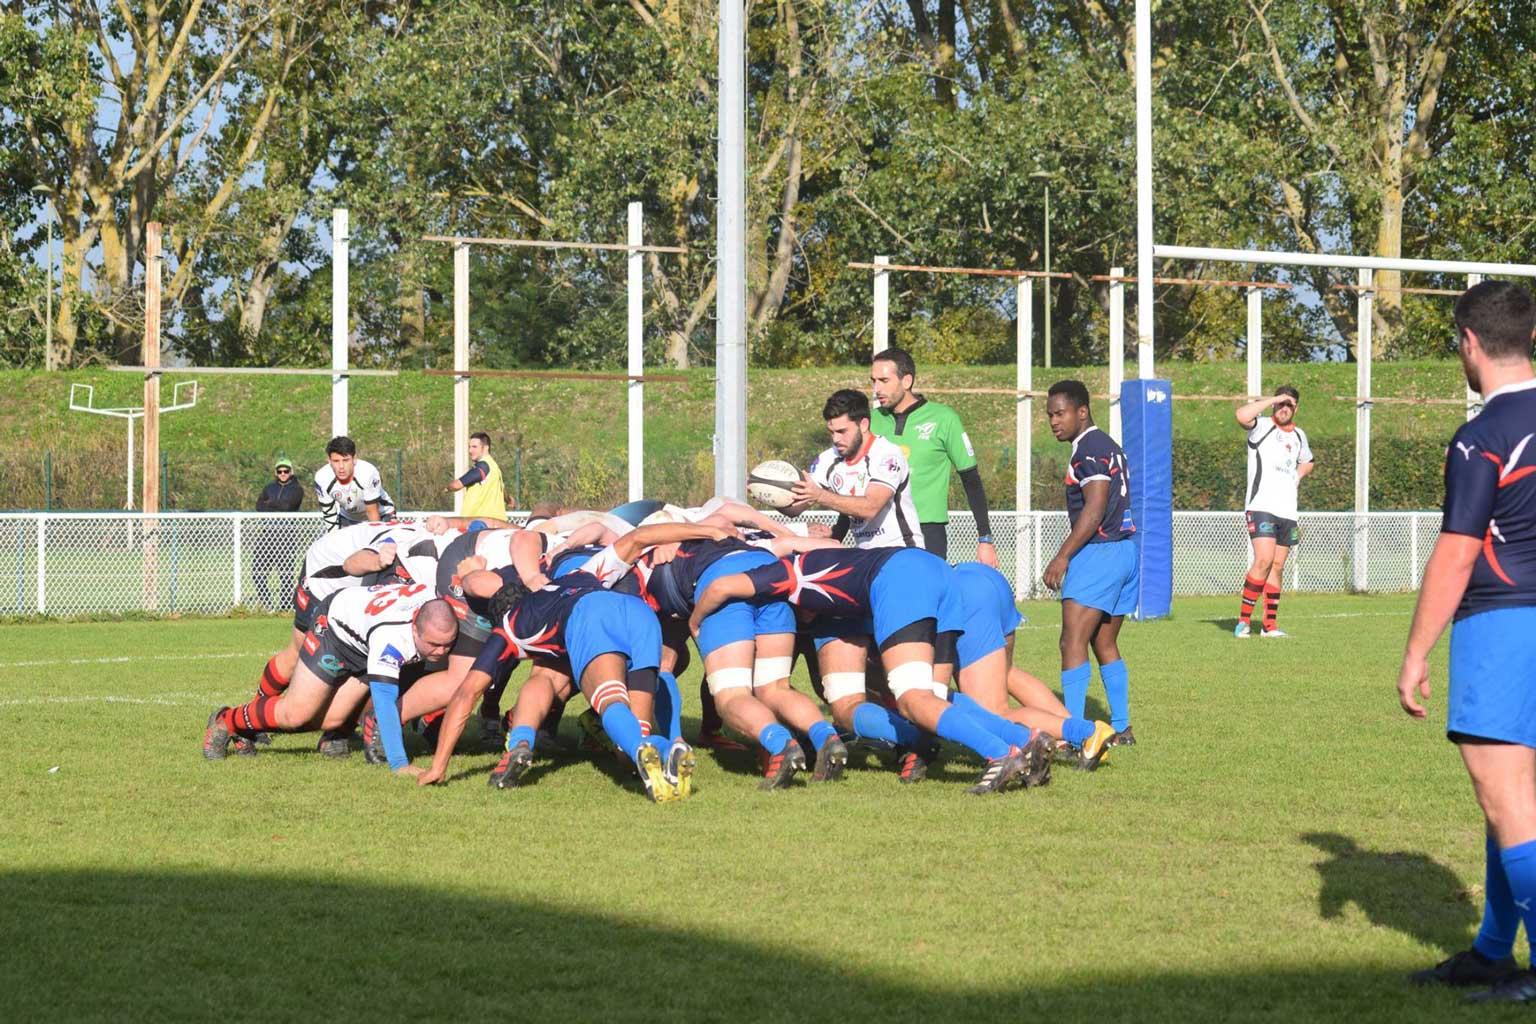 © 2018 Maeva Franco - Espoirs - Blagnac vs Graulhet - Photo 11